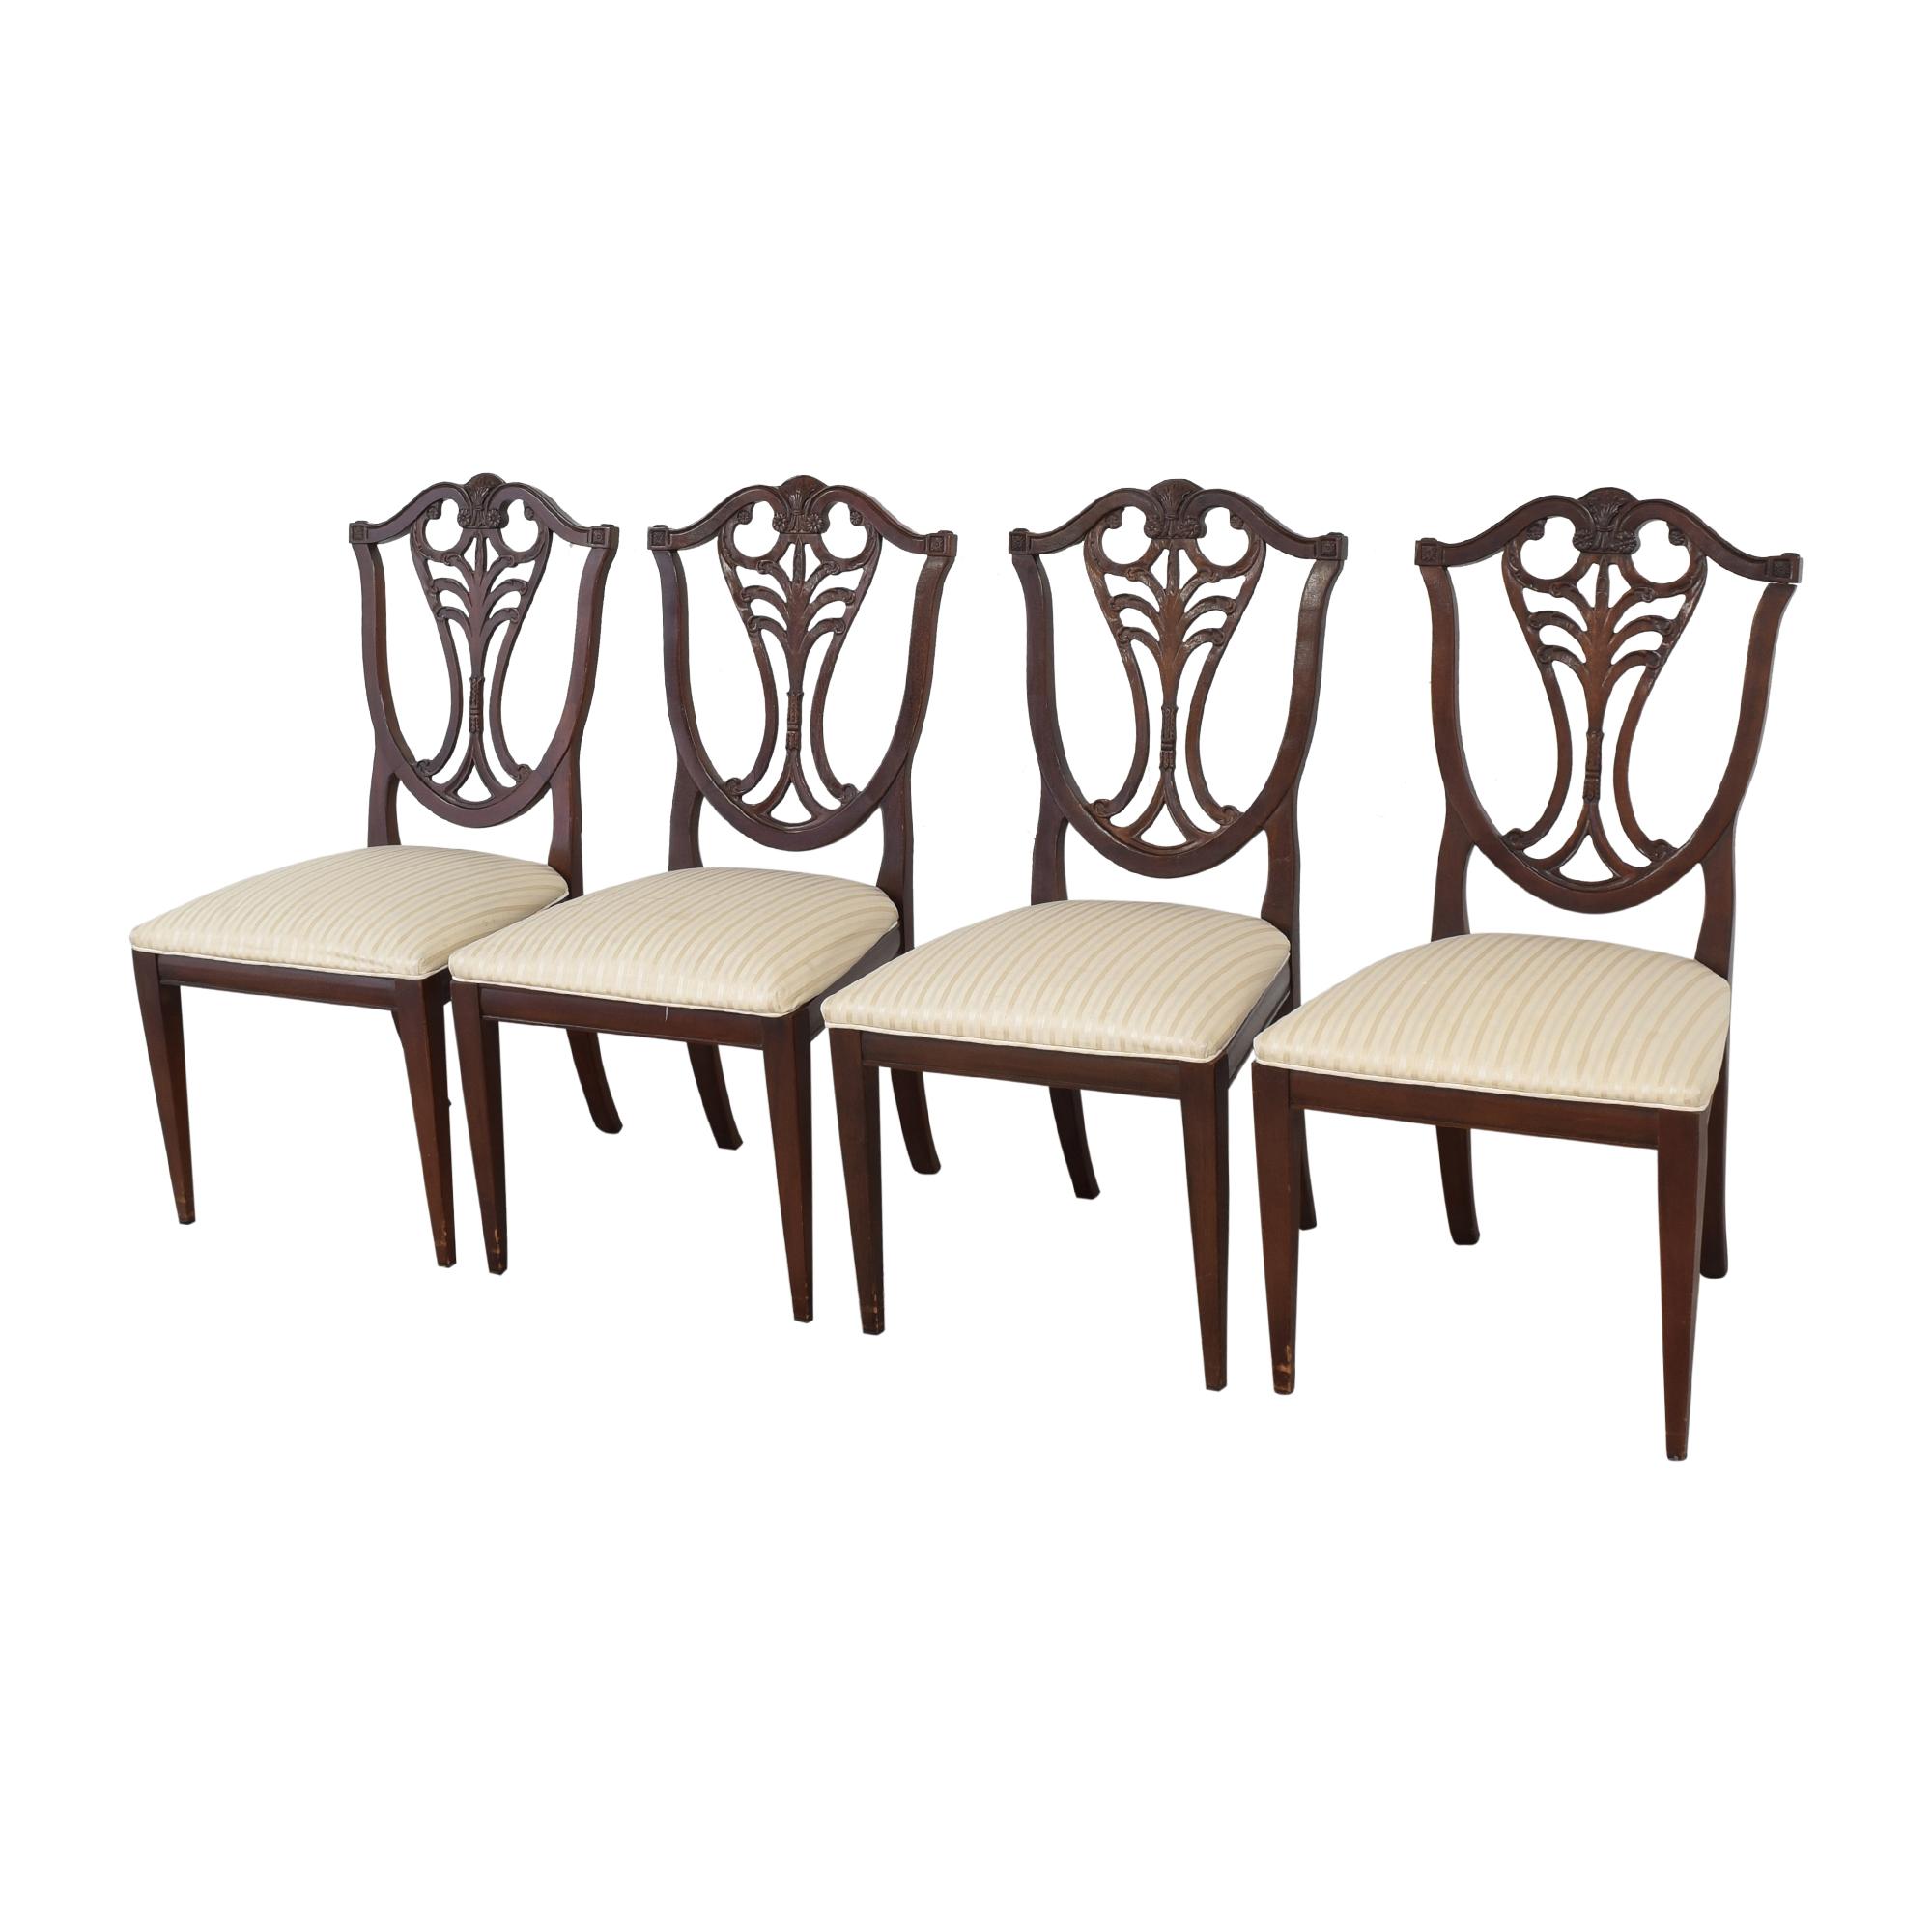 Henredon Furniture Henredon Furniture Dining Chairs pa